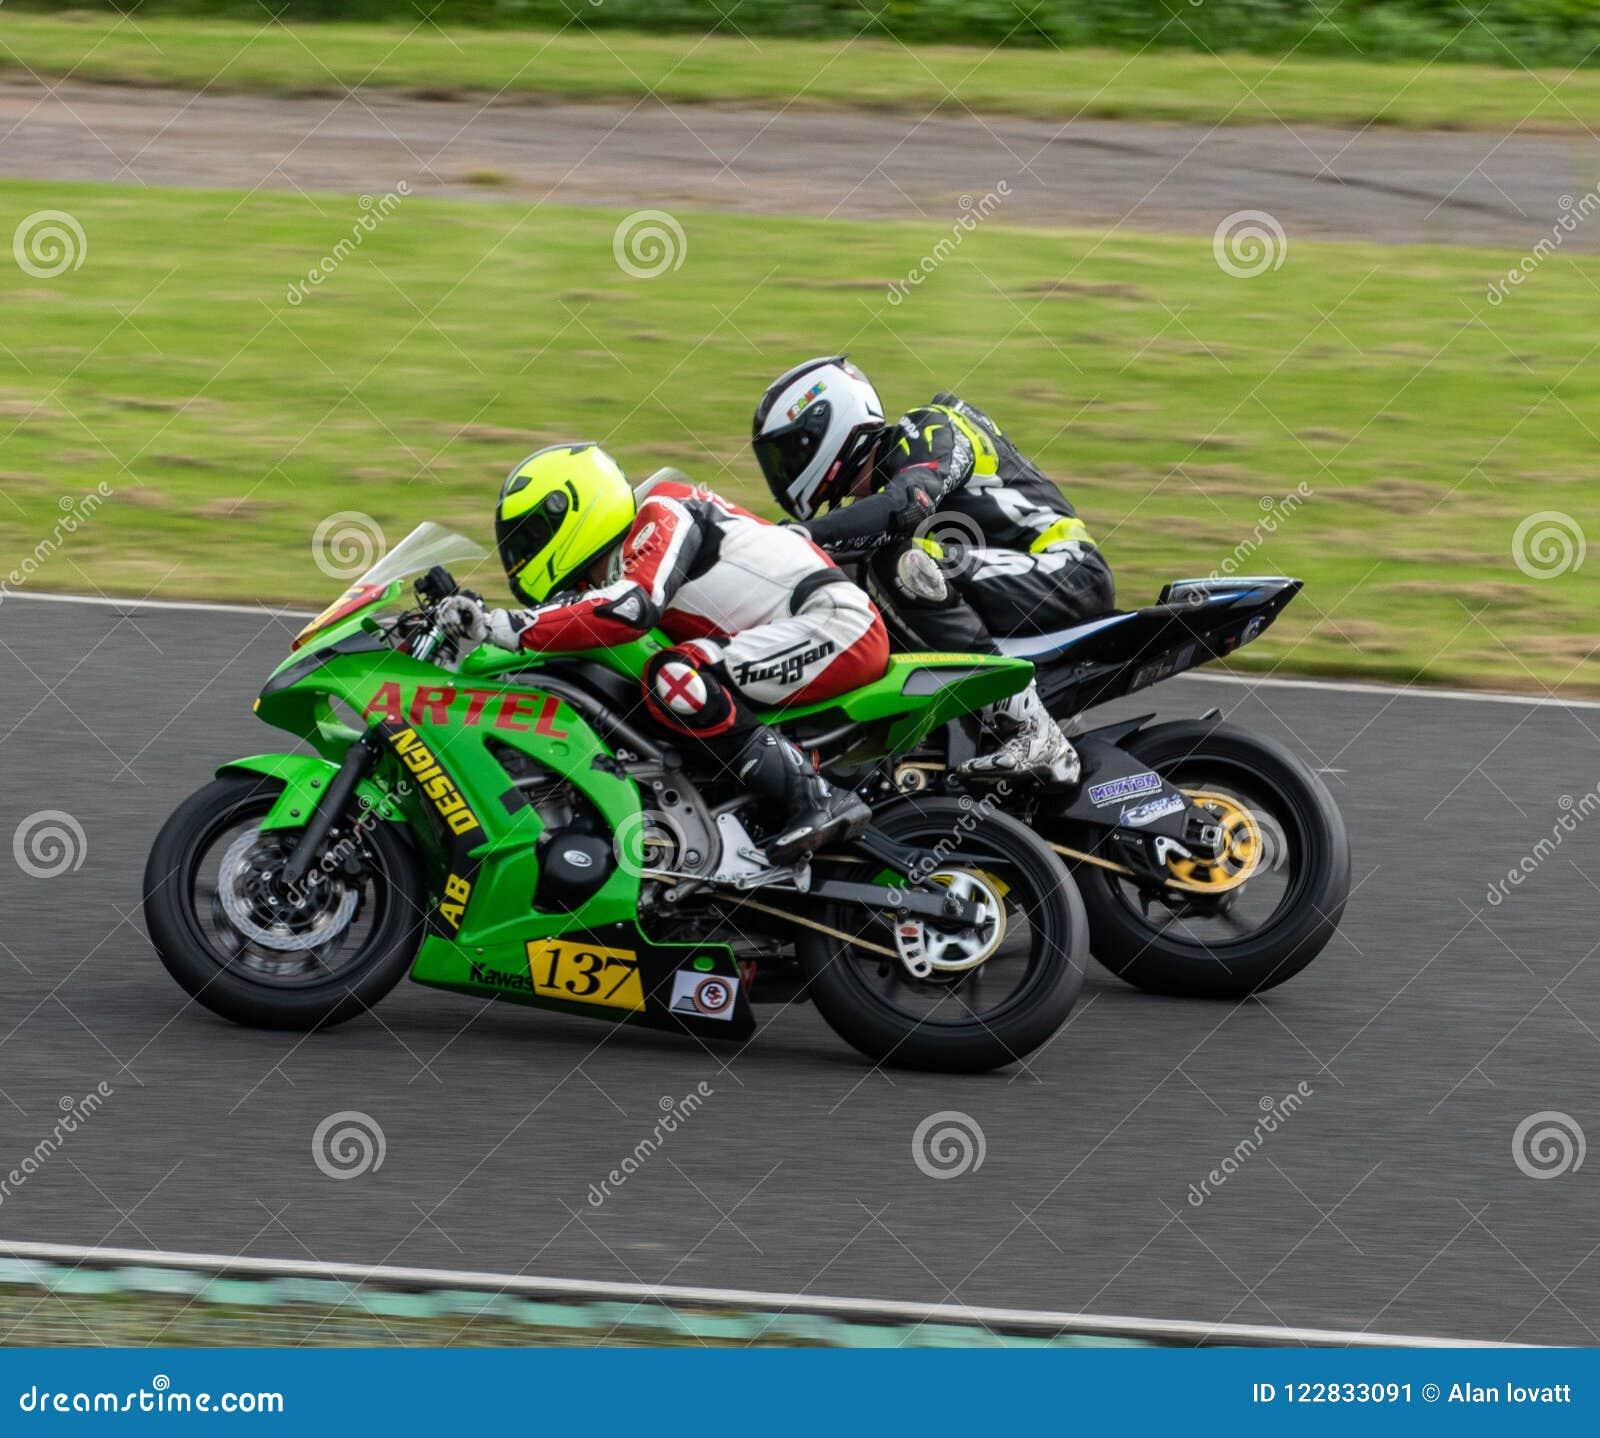 Mallory Park Motorcycle Racing